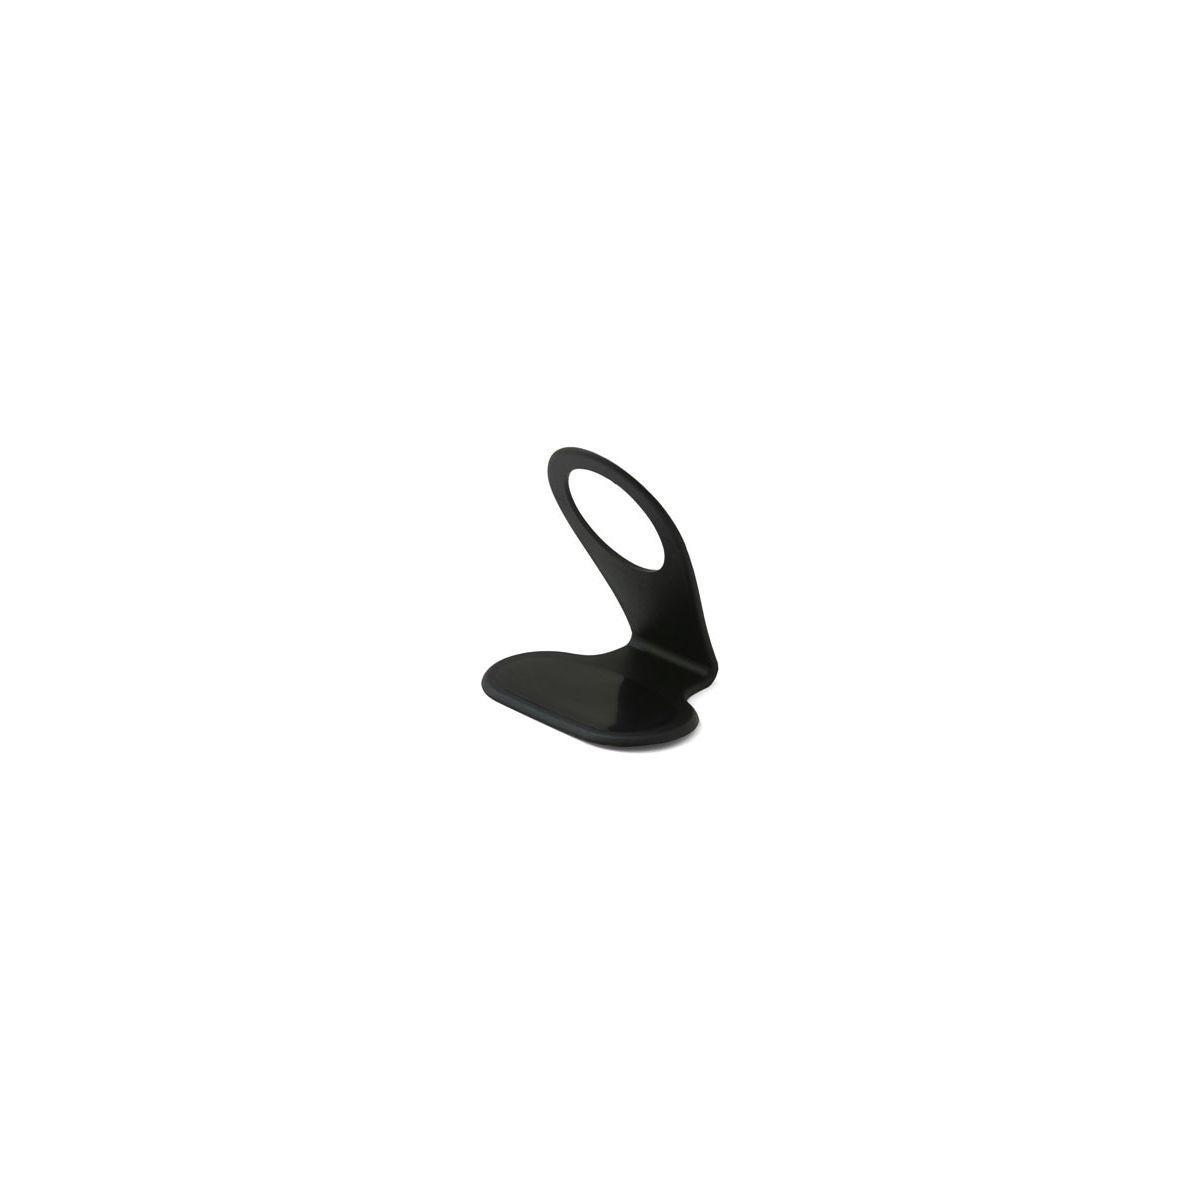 Support driinn porte-portable xl pliable noir (photo)